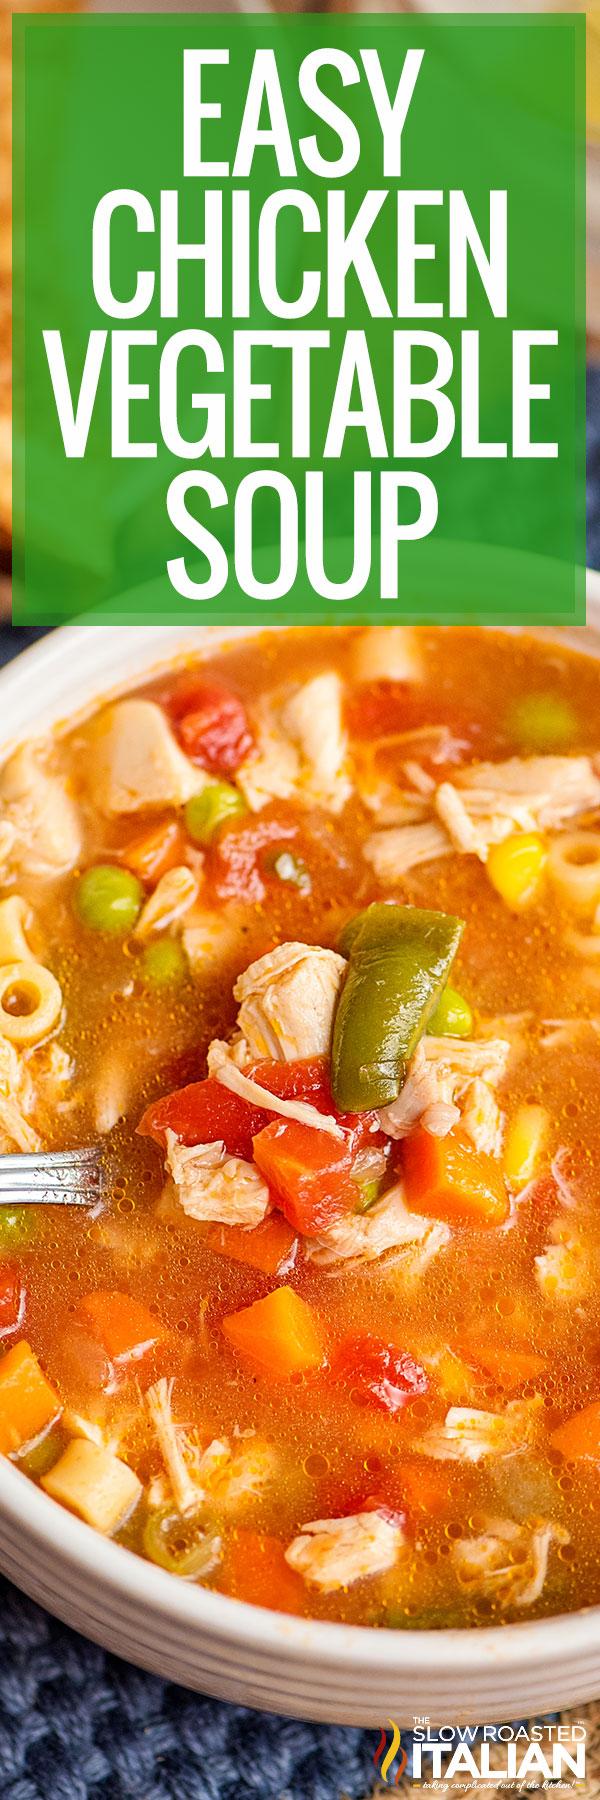 Chicken Vegetable Soup Recipe Closeup